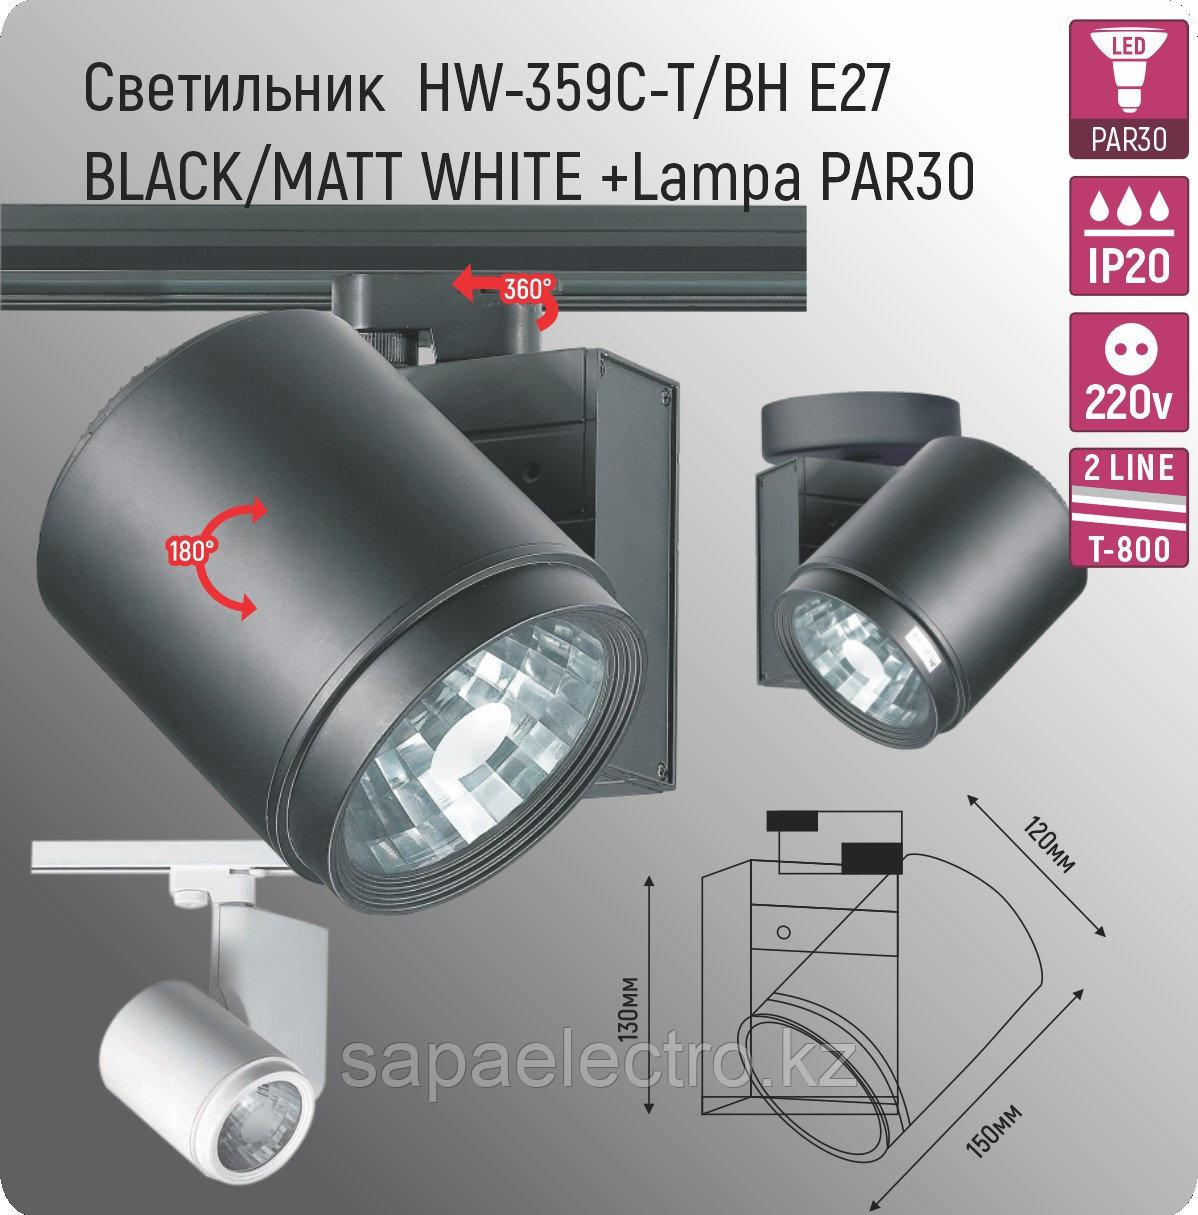 Sv-k HW-359C-T E27 BLACK+Lampa PAR30  (TRACK)(MS)6